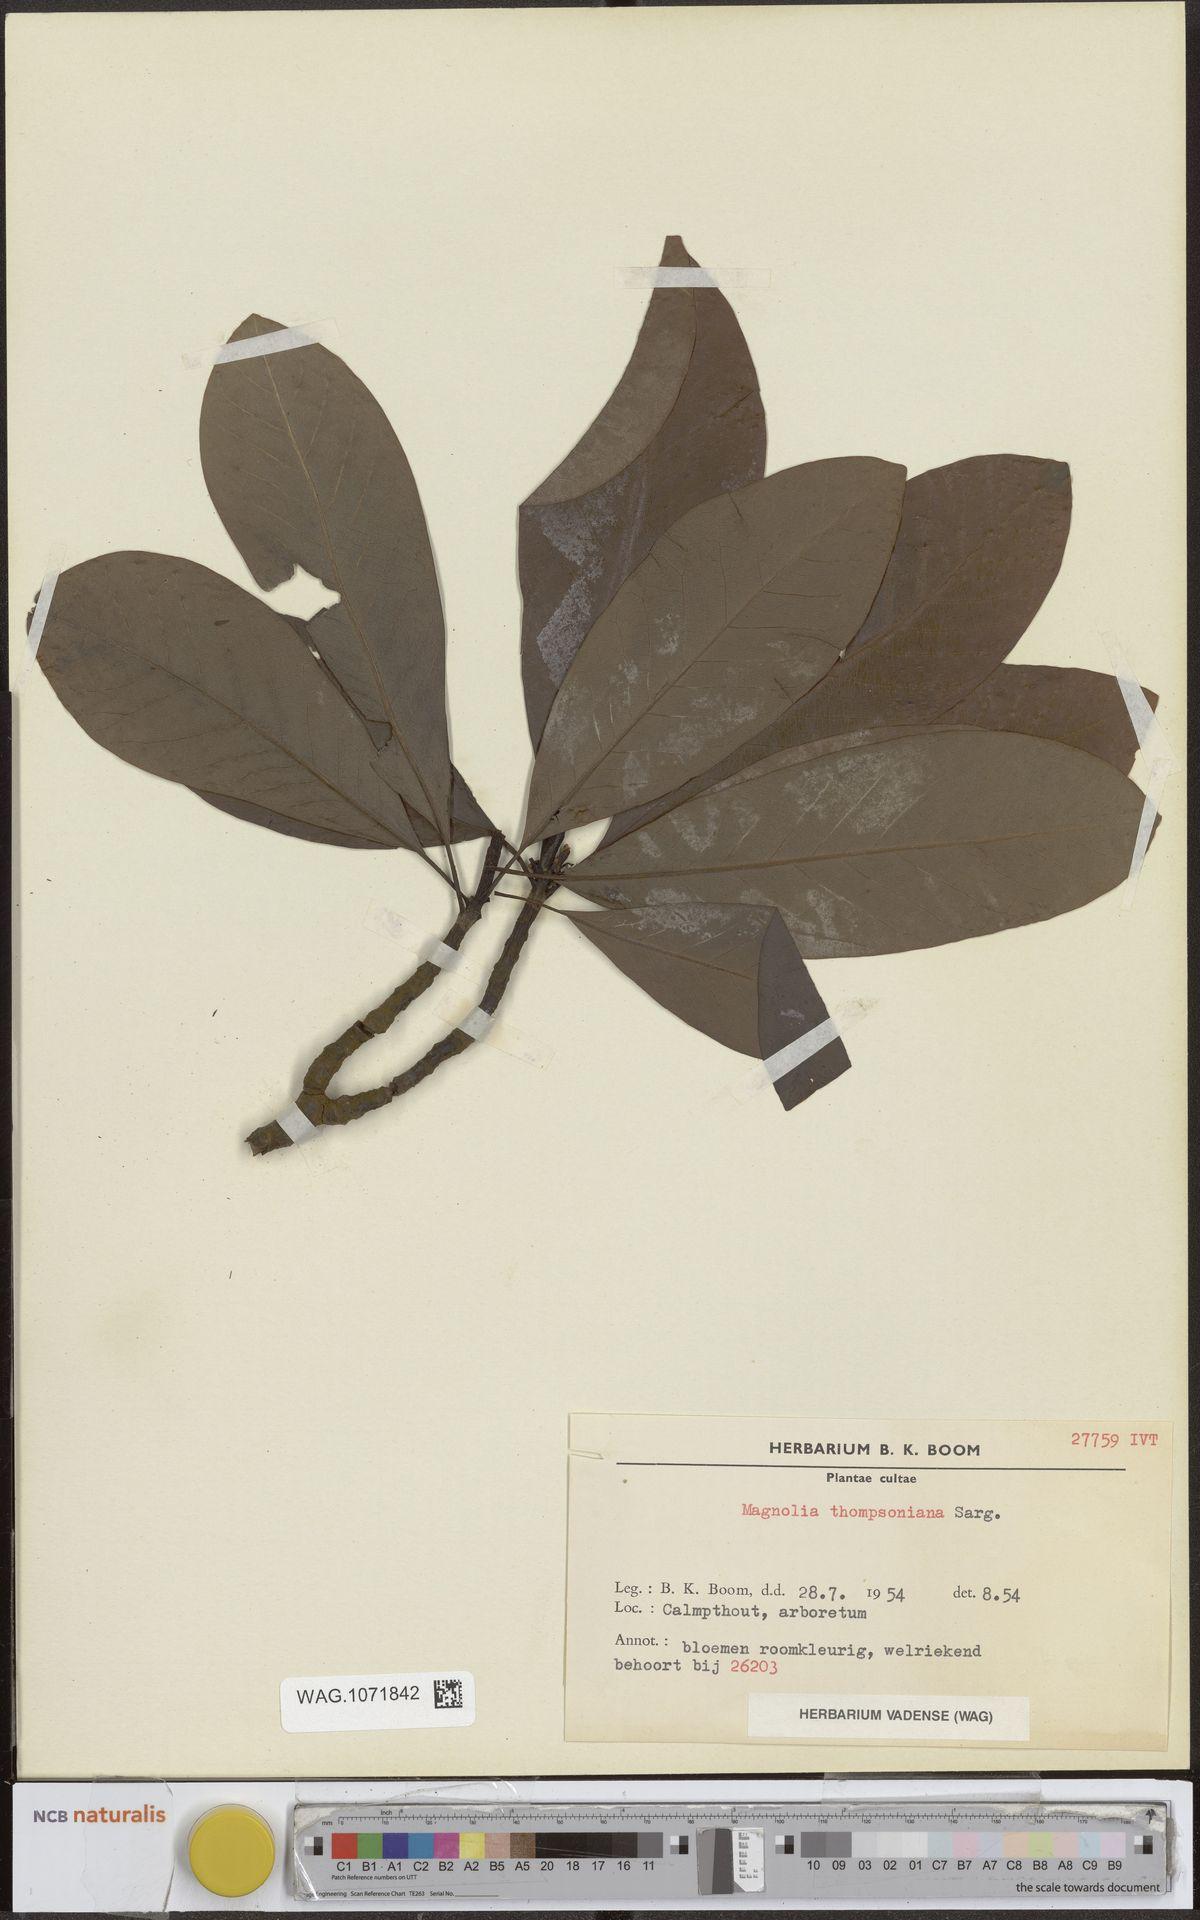 WAG.1071842 | Magnolia ×thompsoniana de Vos